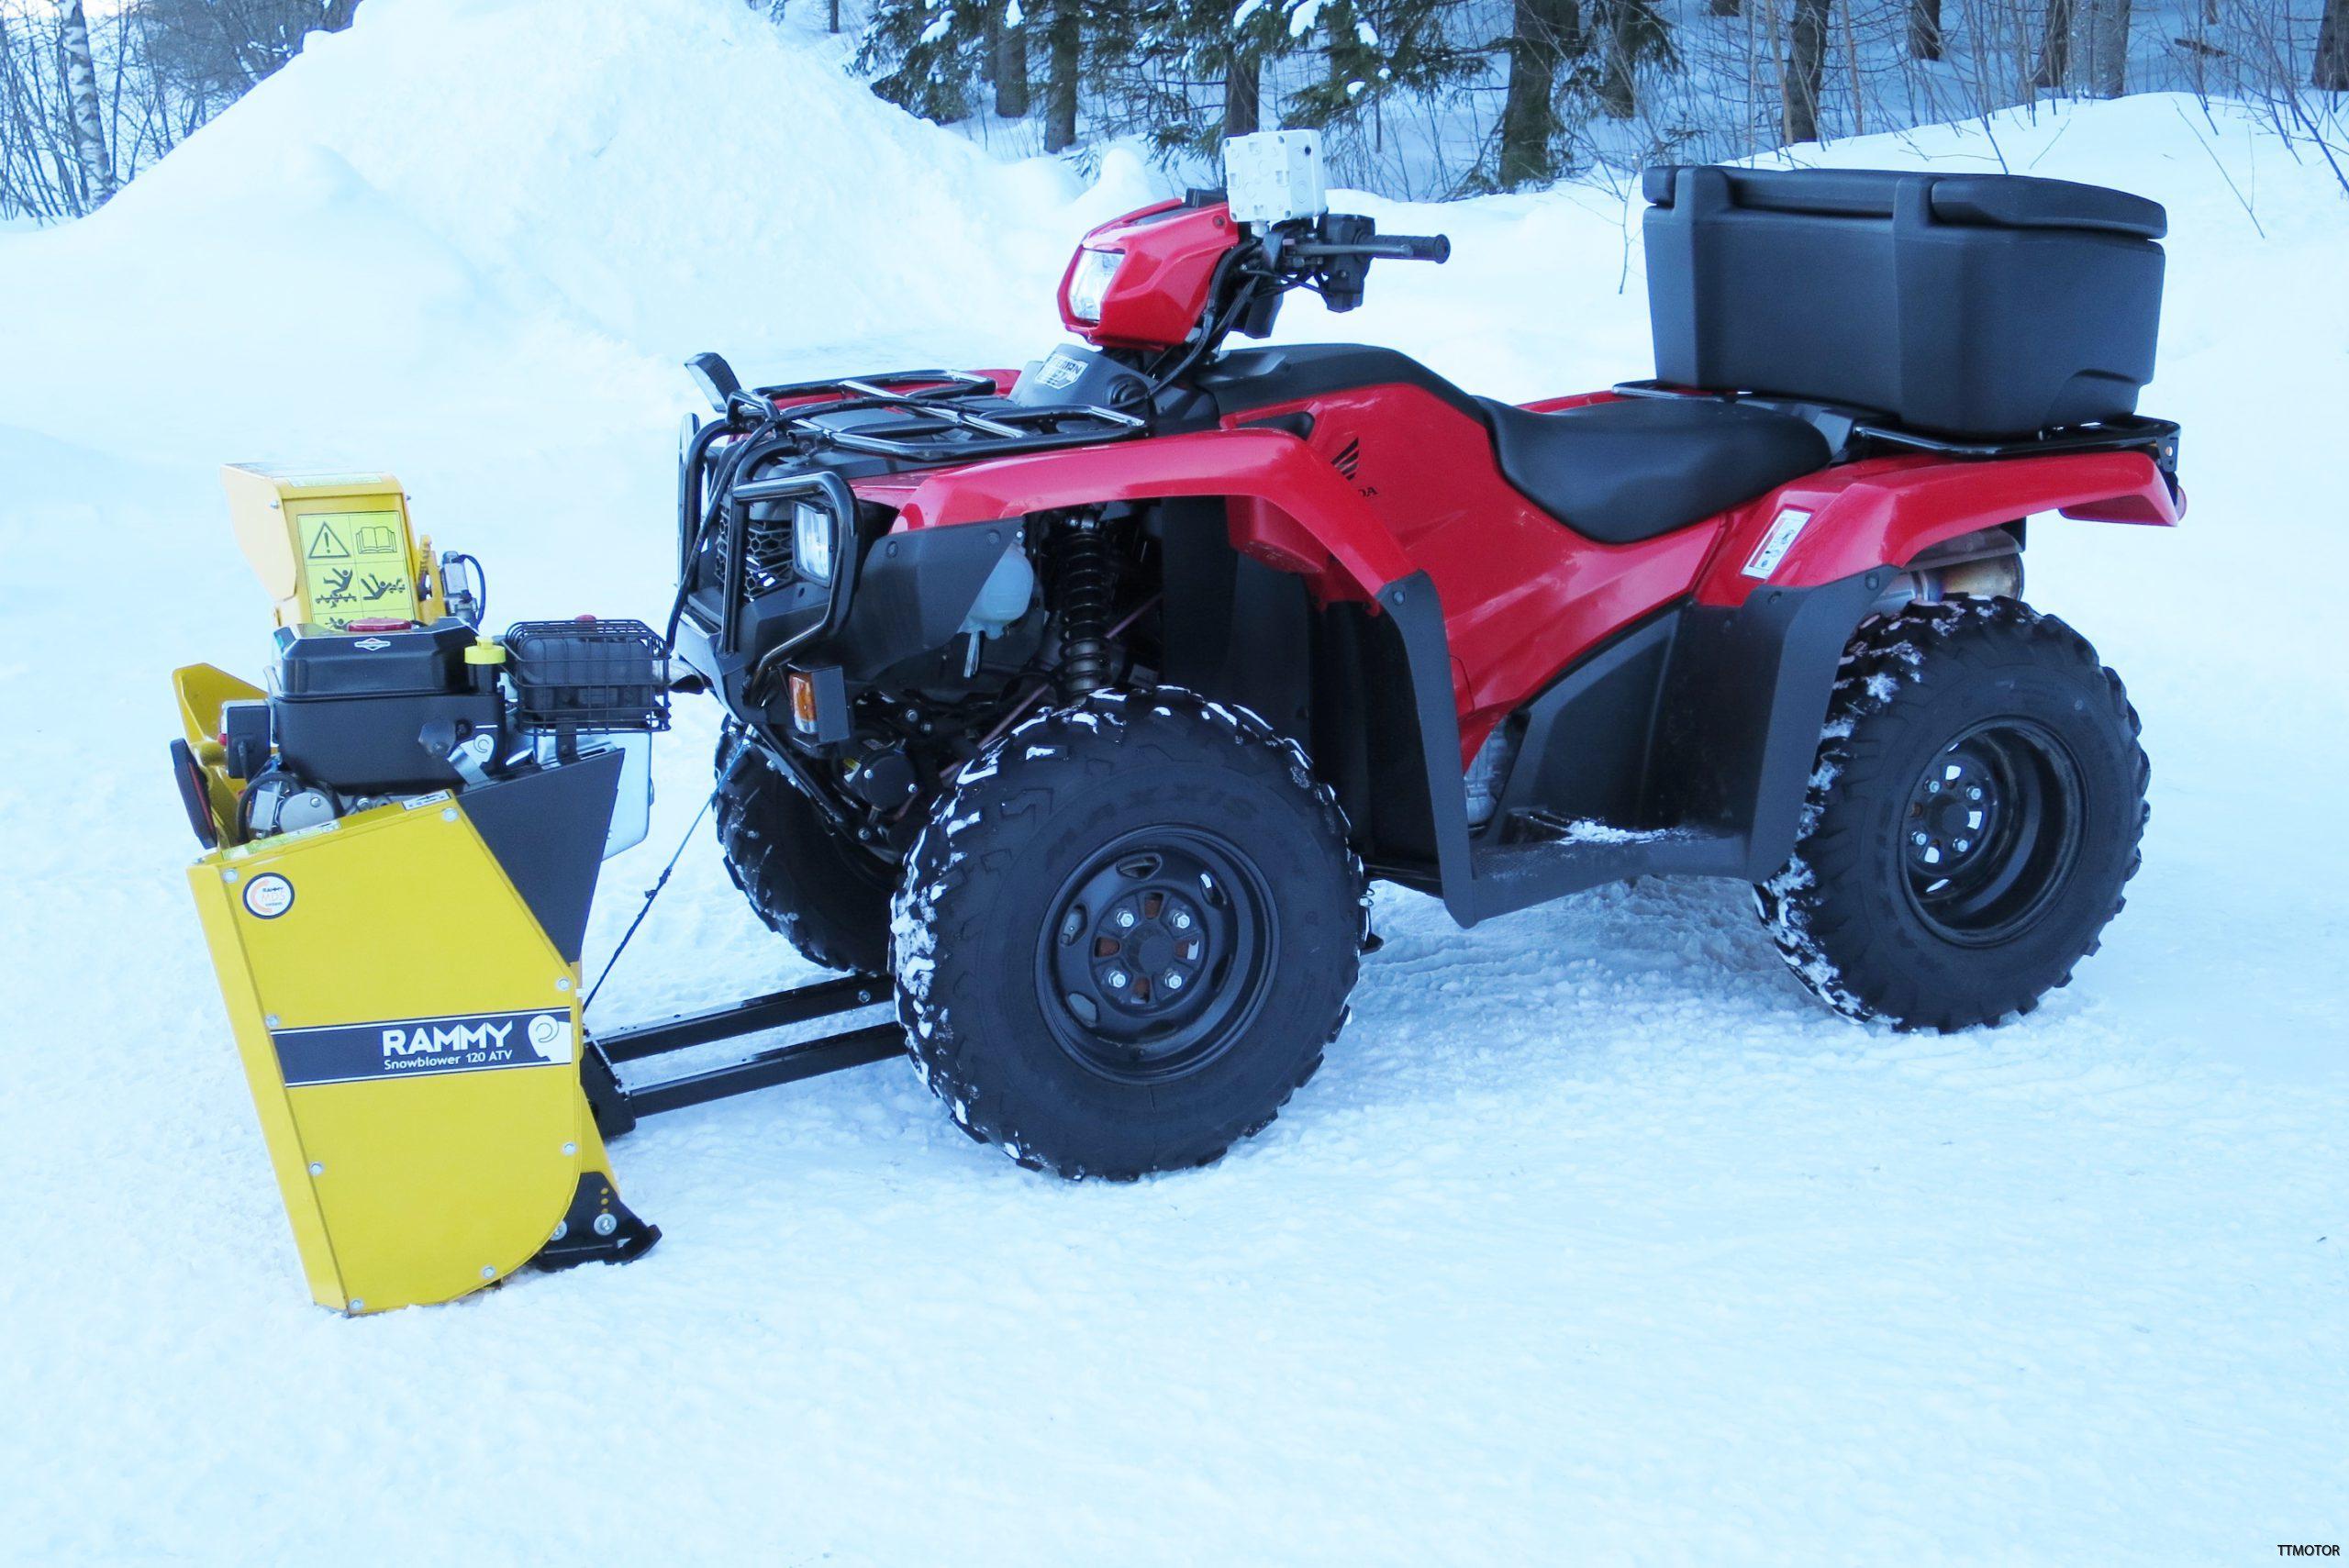 Rammy-Snowblower-EC-120-ATV-2019-11